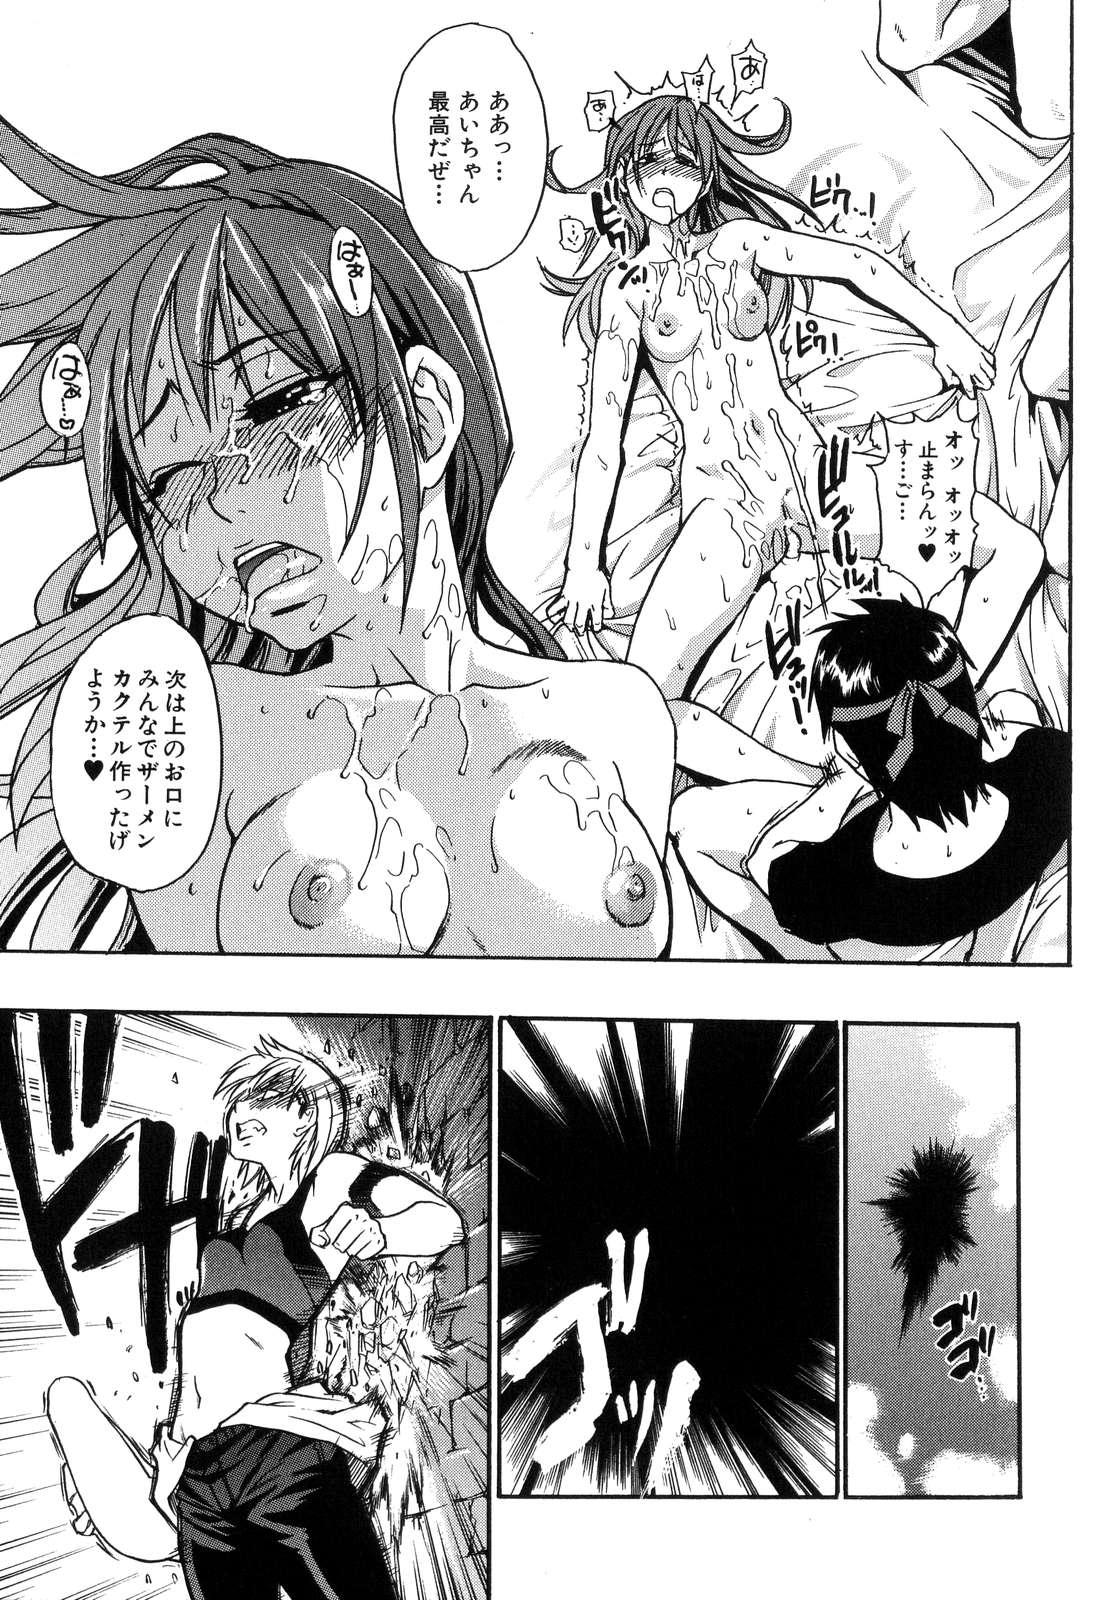 Shining Musume. 6. Rainbow Six 132